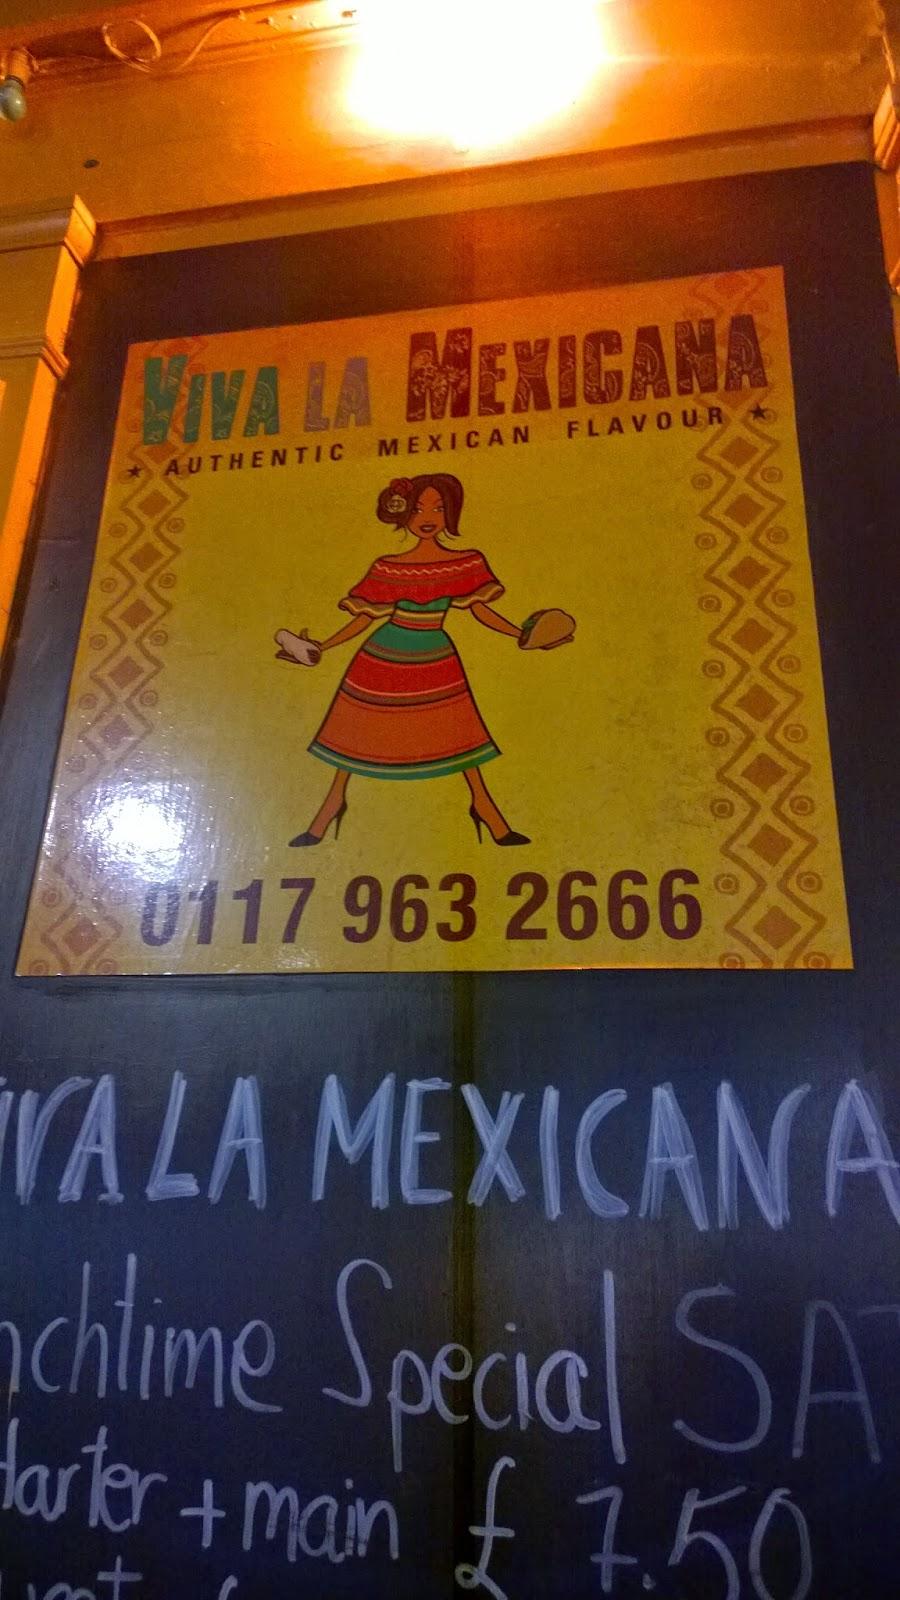 viva la mexicana Bristol